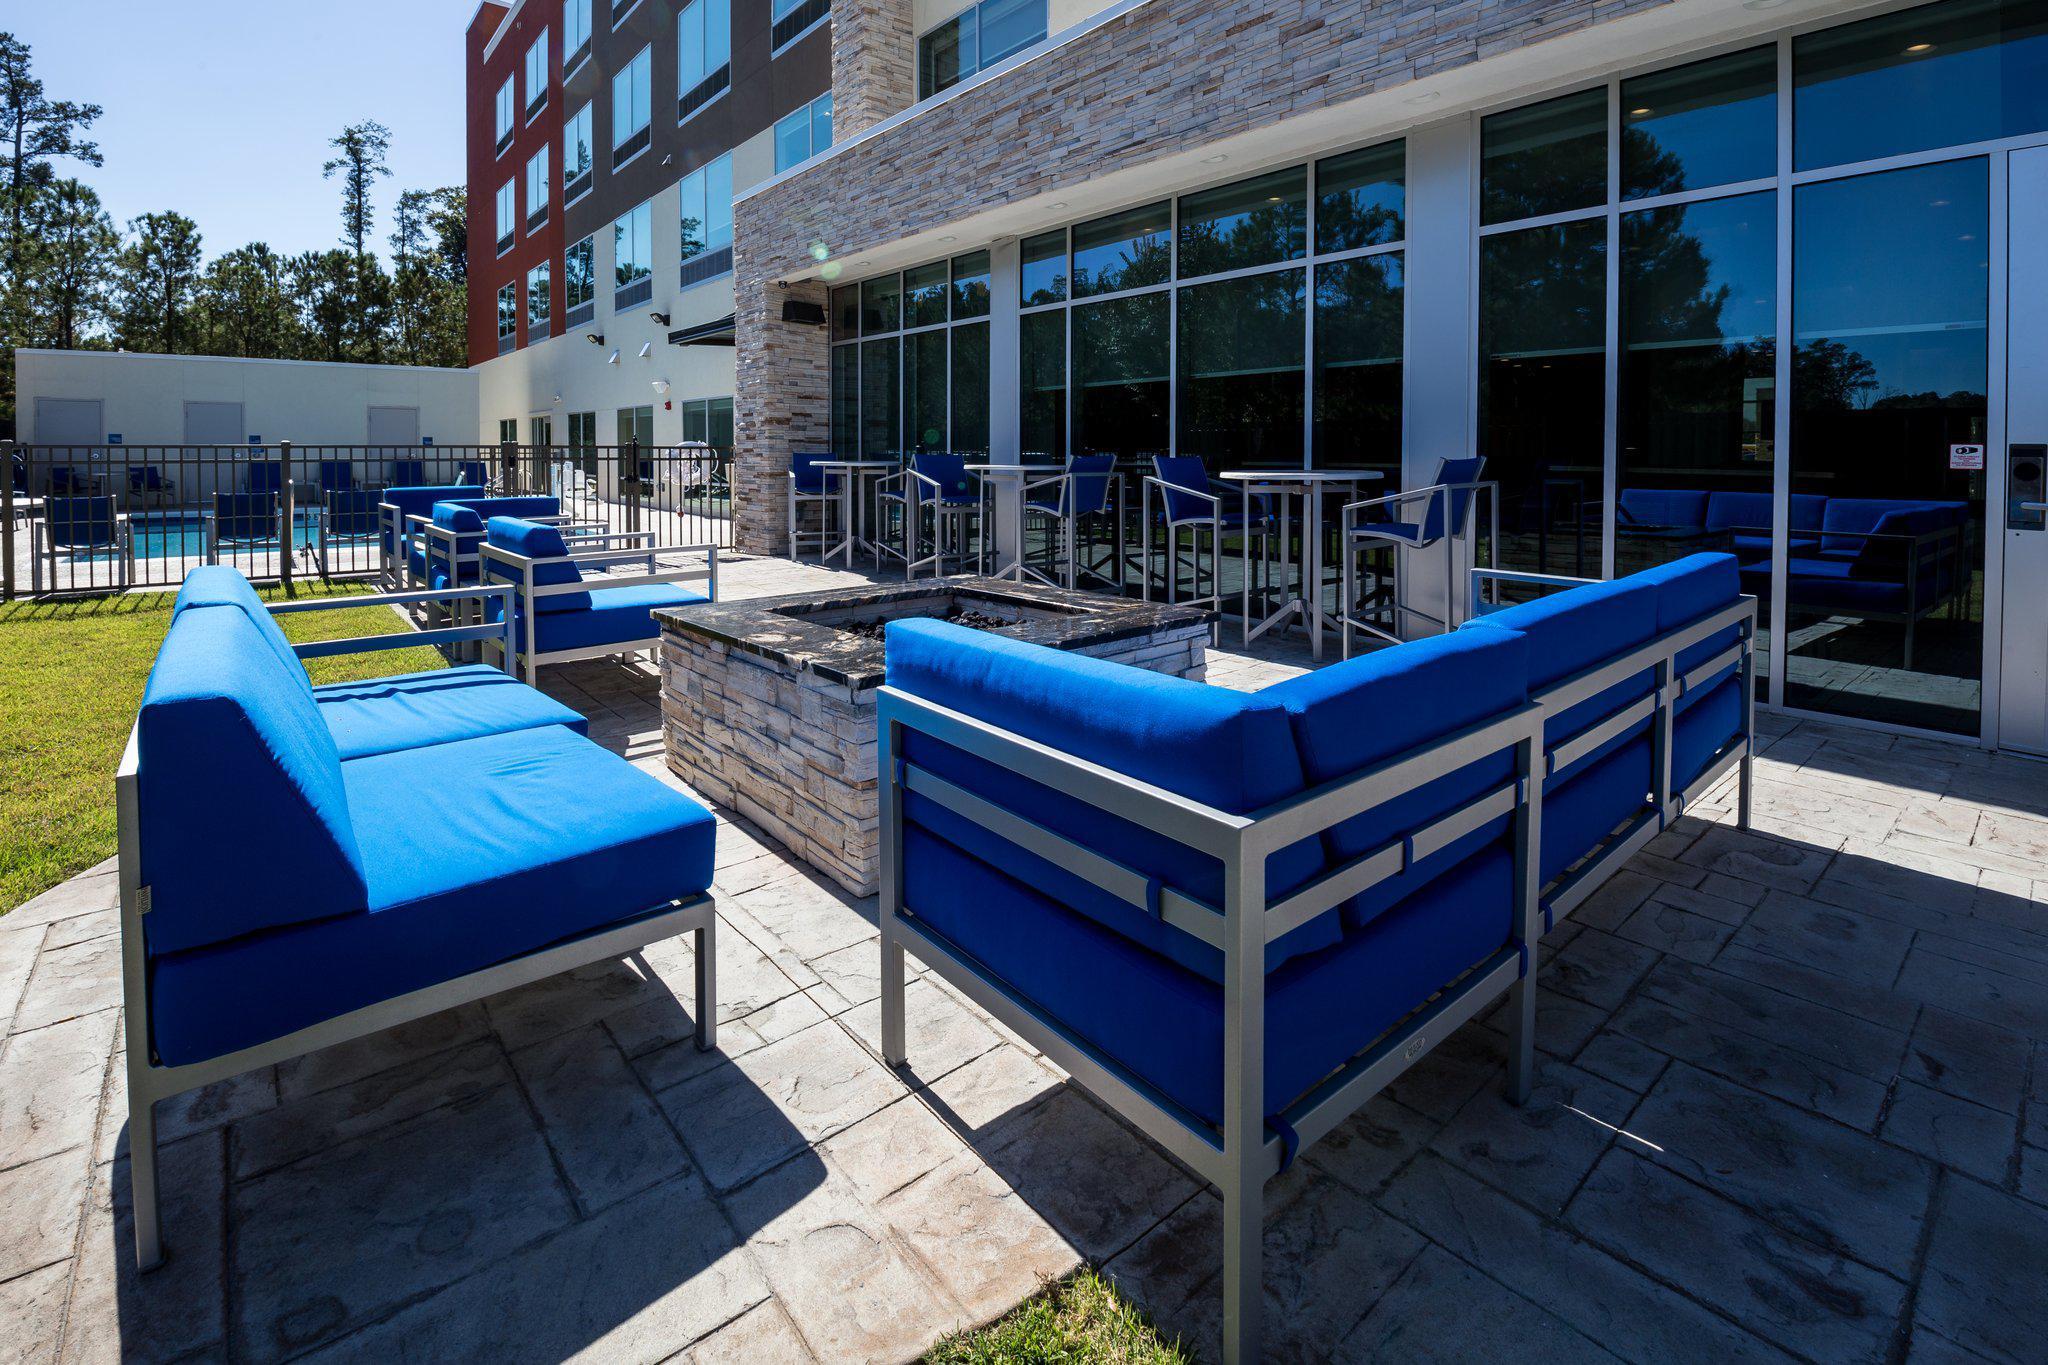 Holiday Inn Express North Augusta - SC, an IHG Hotel